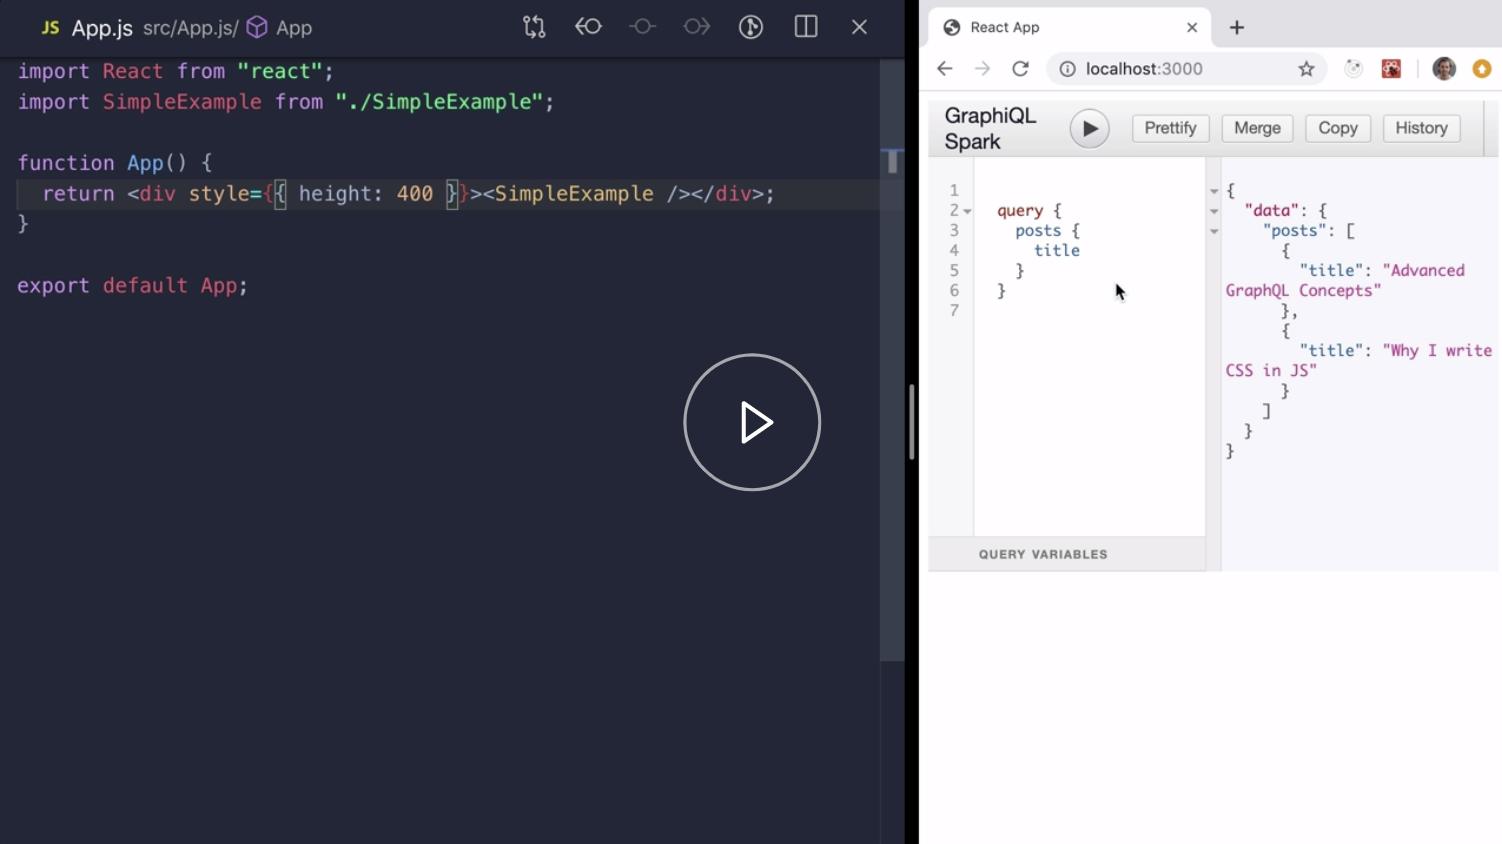 GraphiQlSpark Simple Example Demo